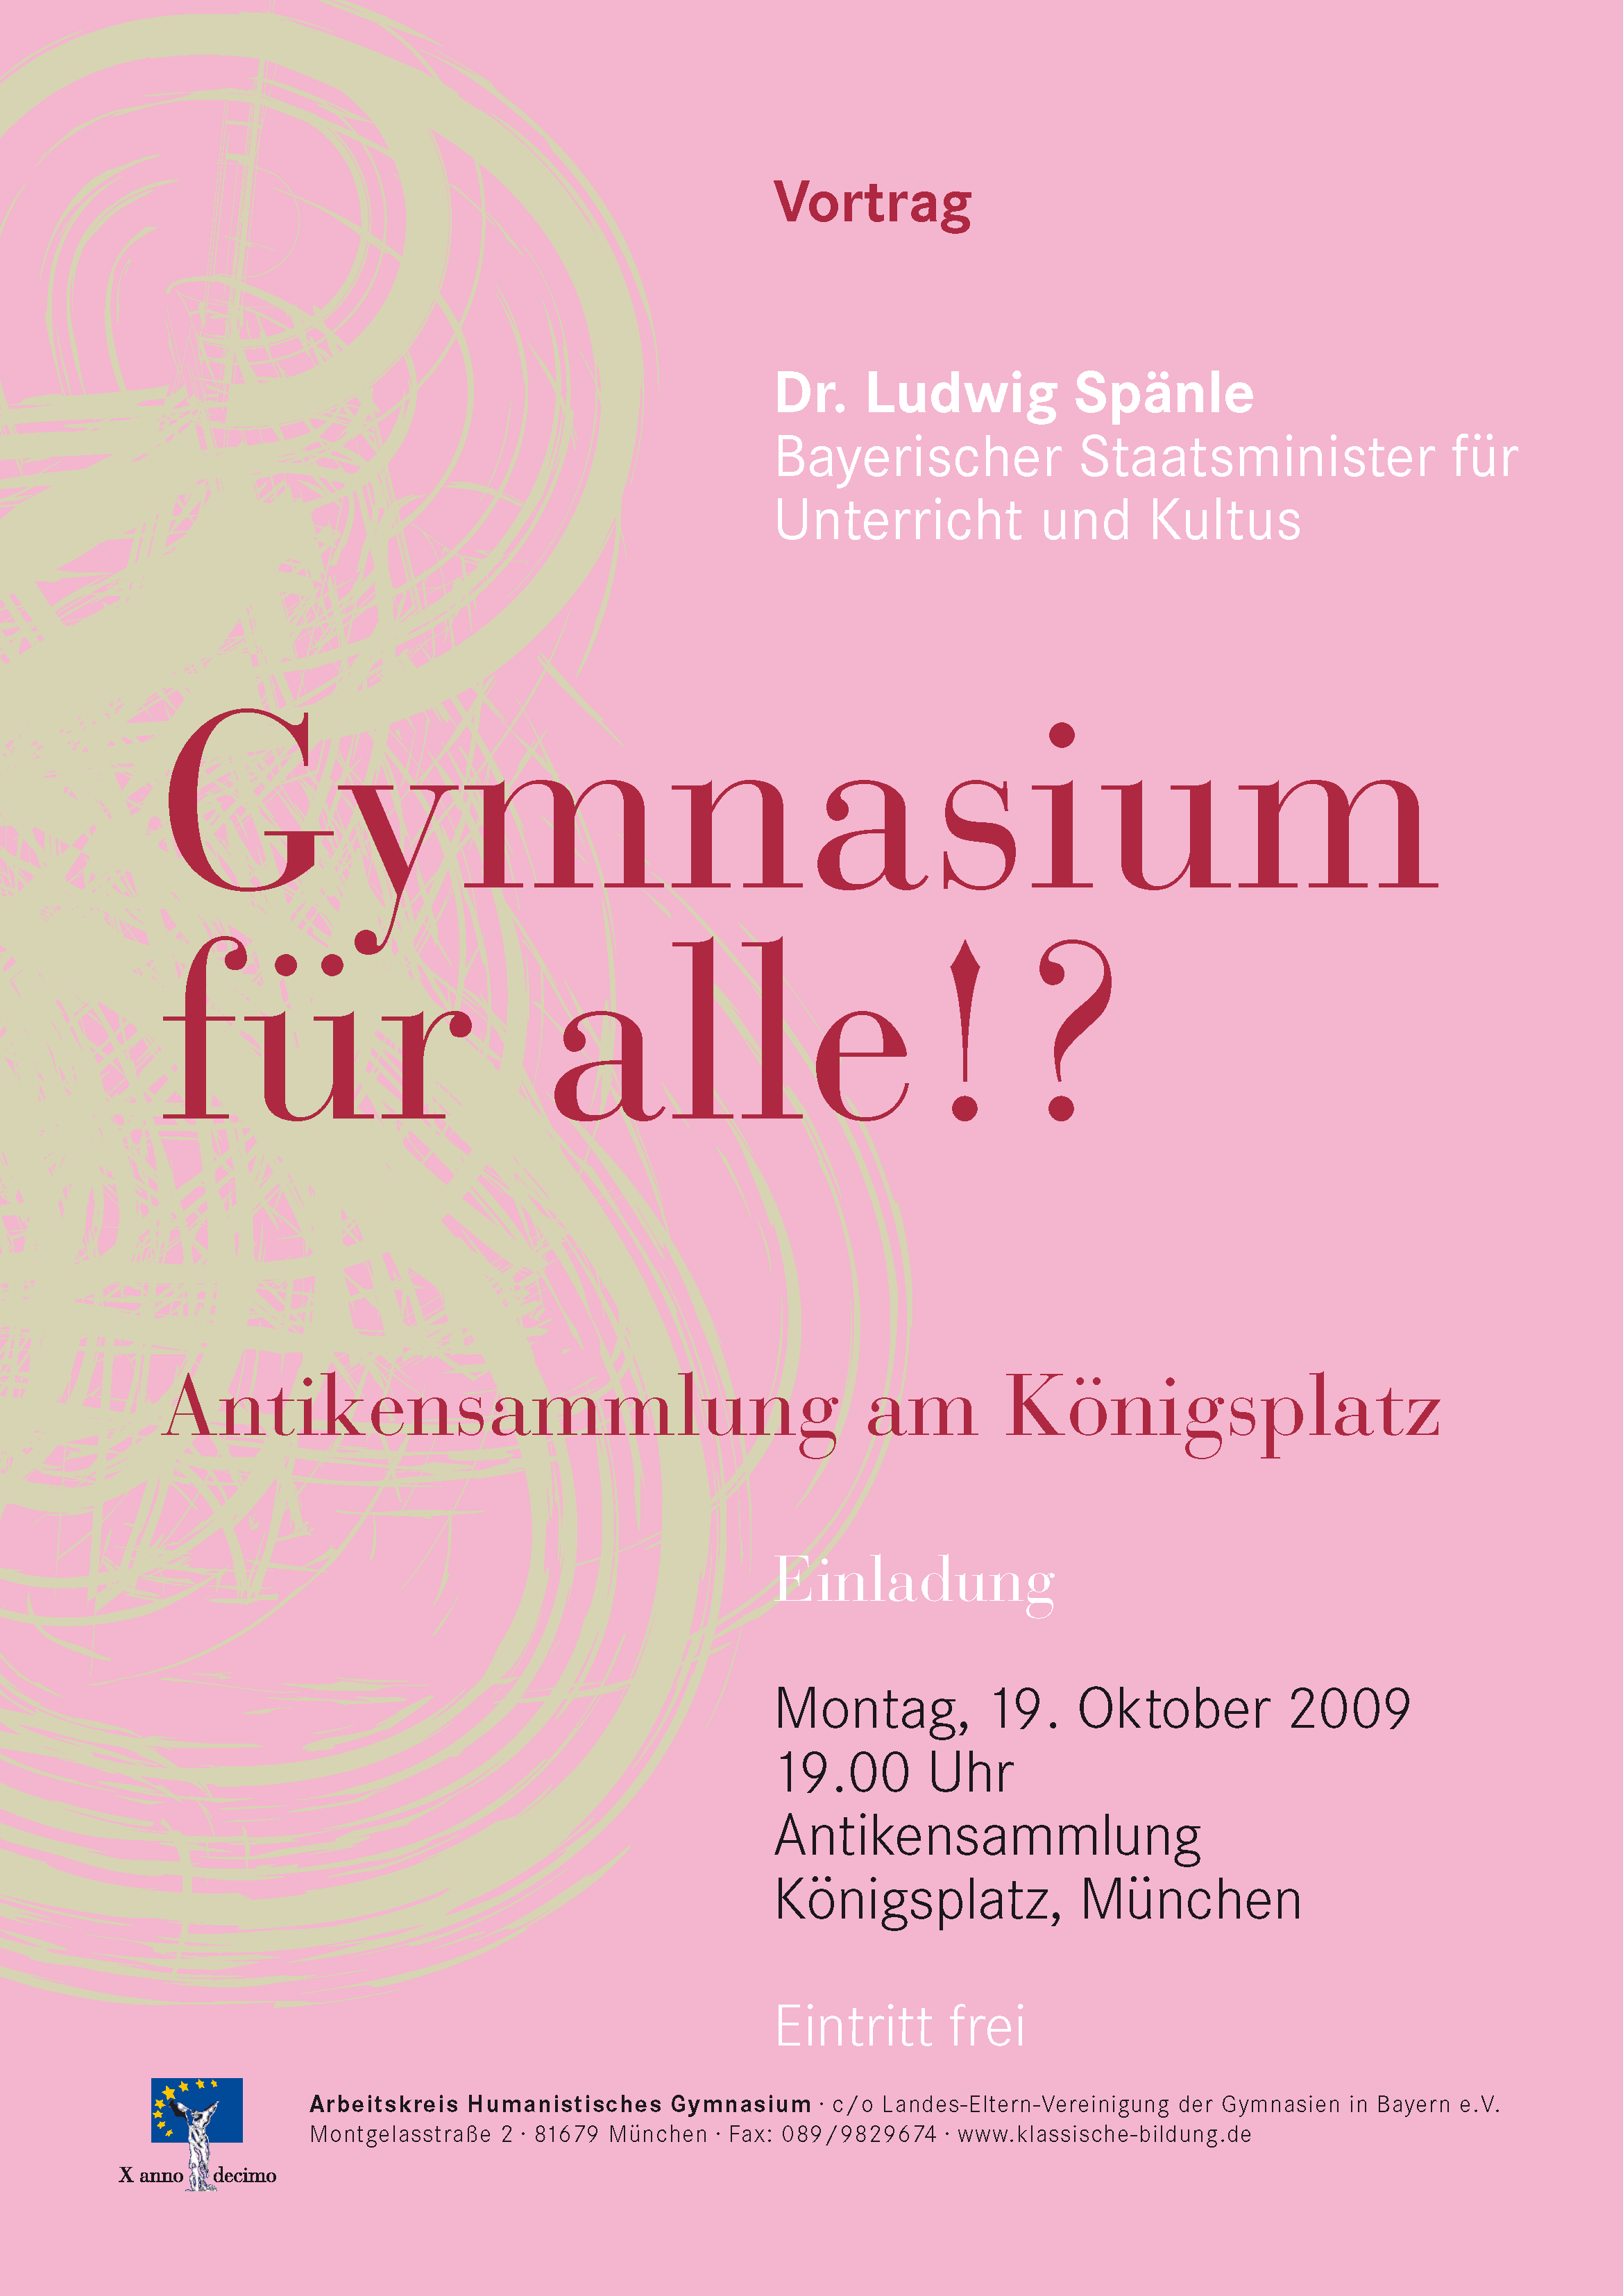 Plakat _Spänle_Gym.png